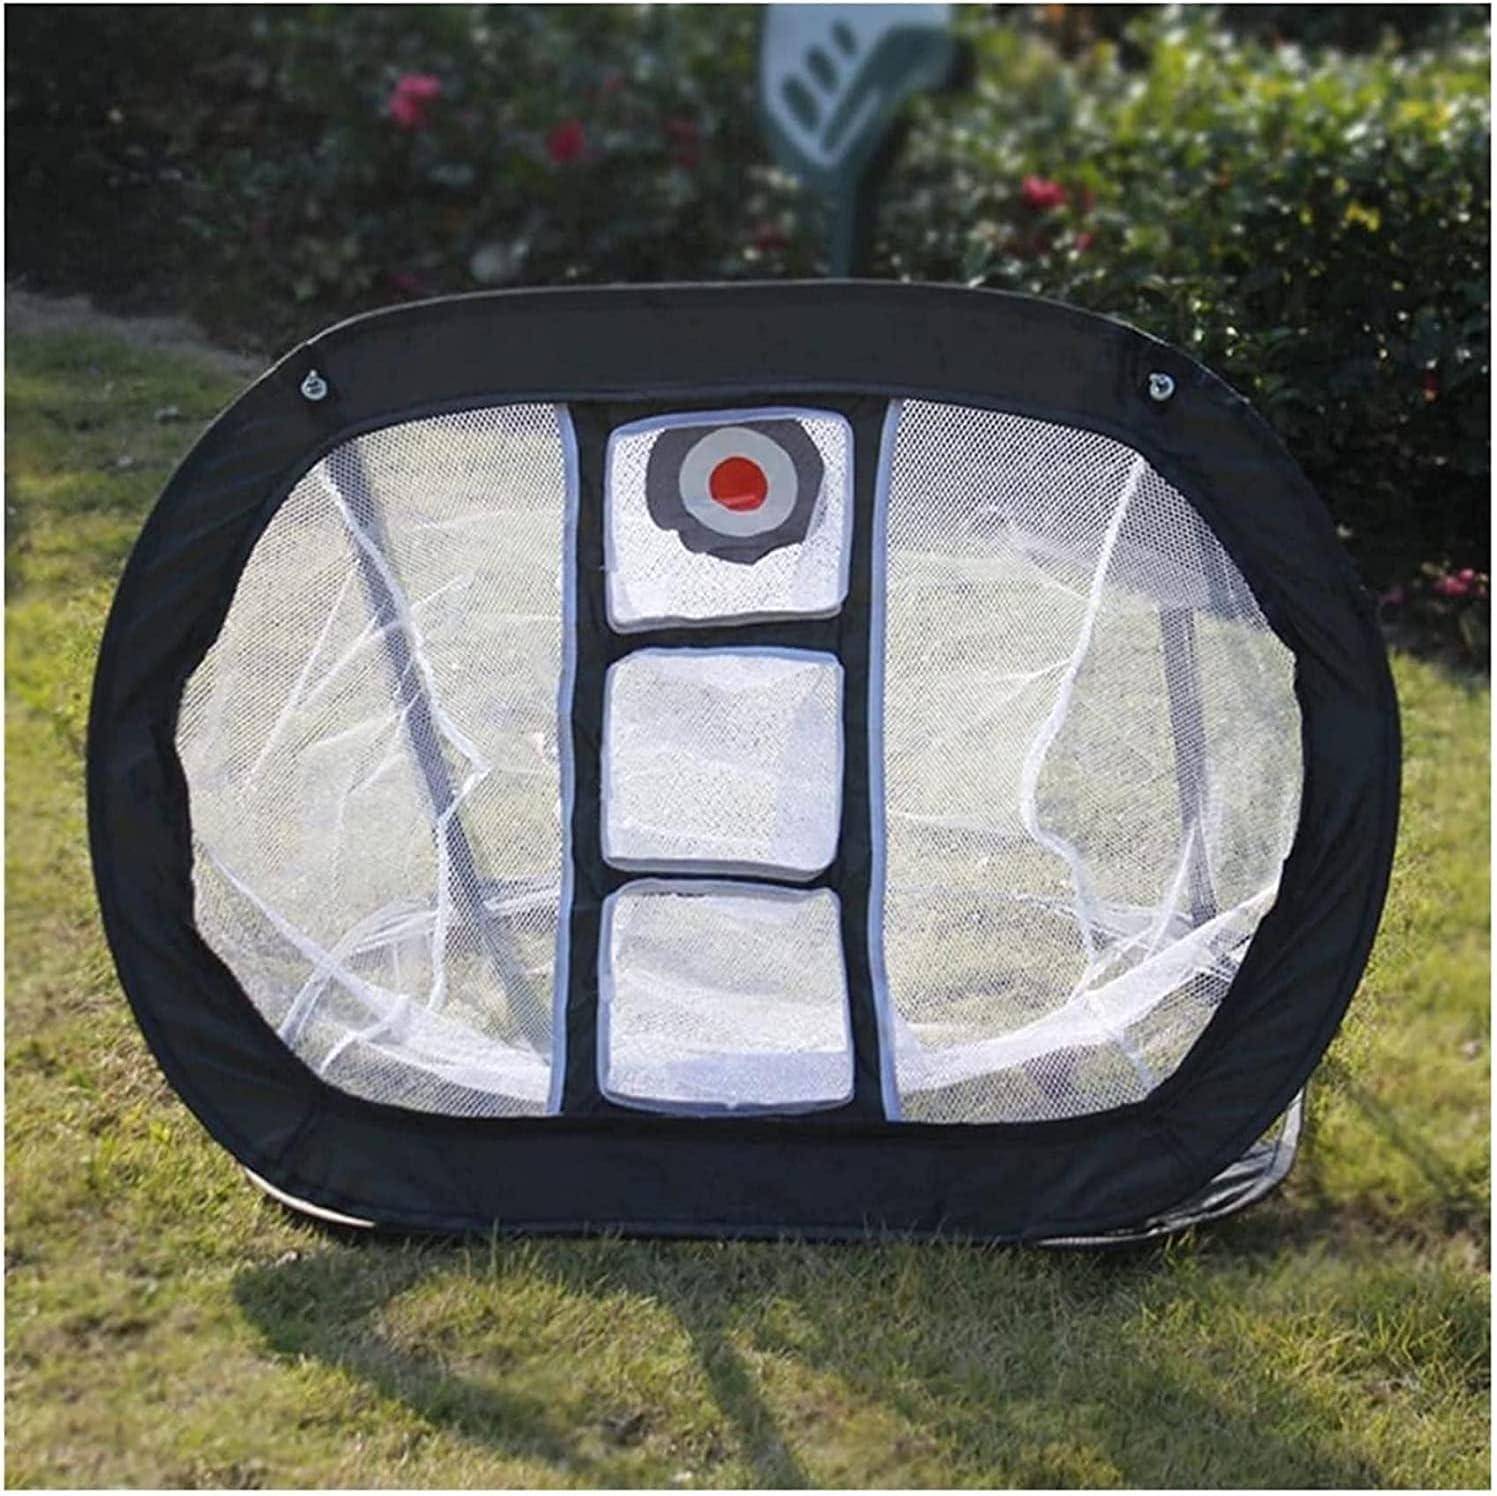 RDJSHOP Golf Net Foldable Backyarder Rod Tool Cutting Sale Training P Beauty products